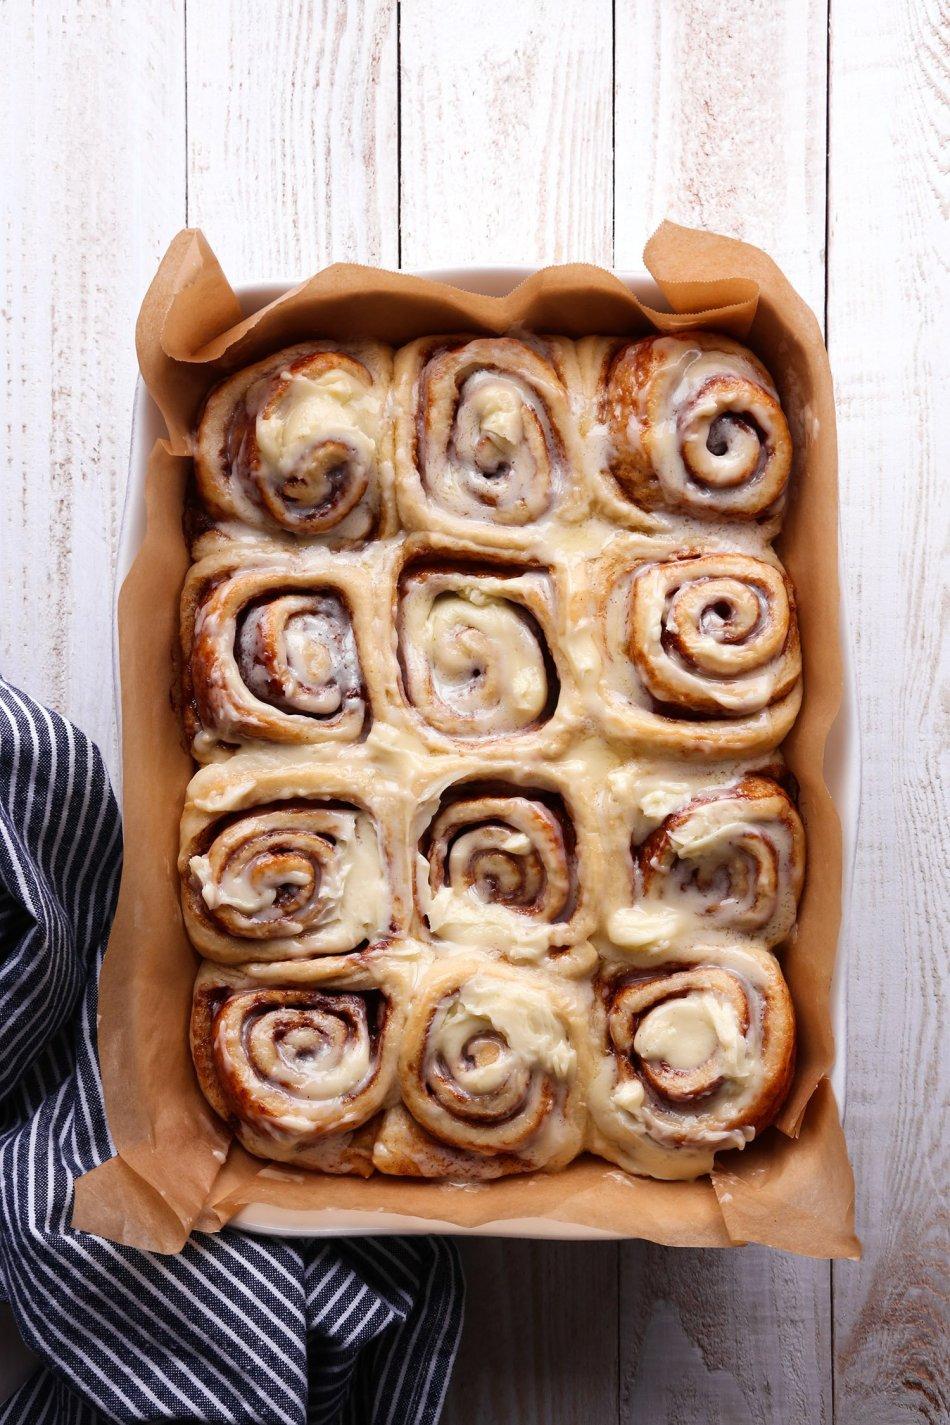 Simple Cinnamon Rolls | Refined Sugar Free and Vegan Friendly | Wife Mama Foodie